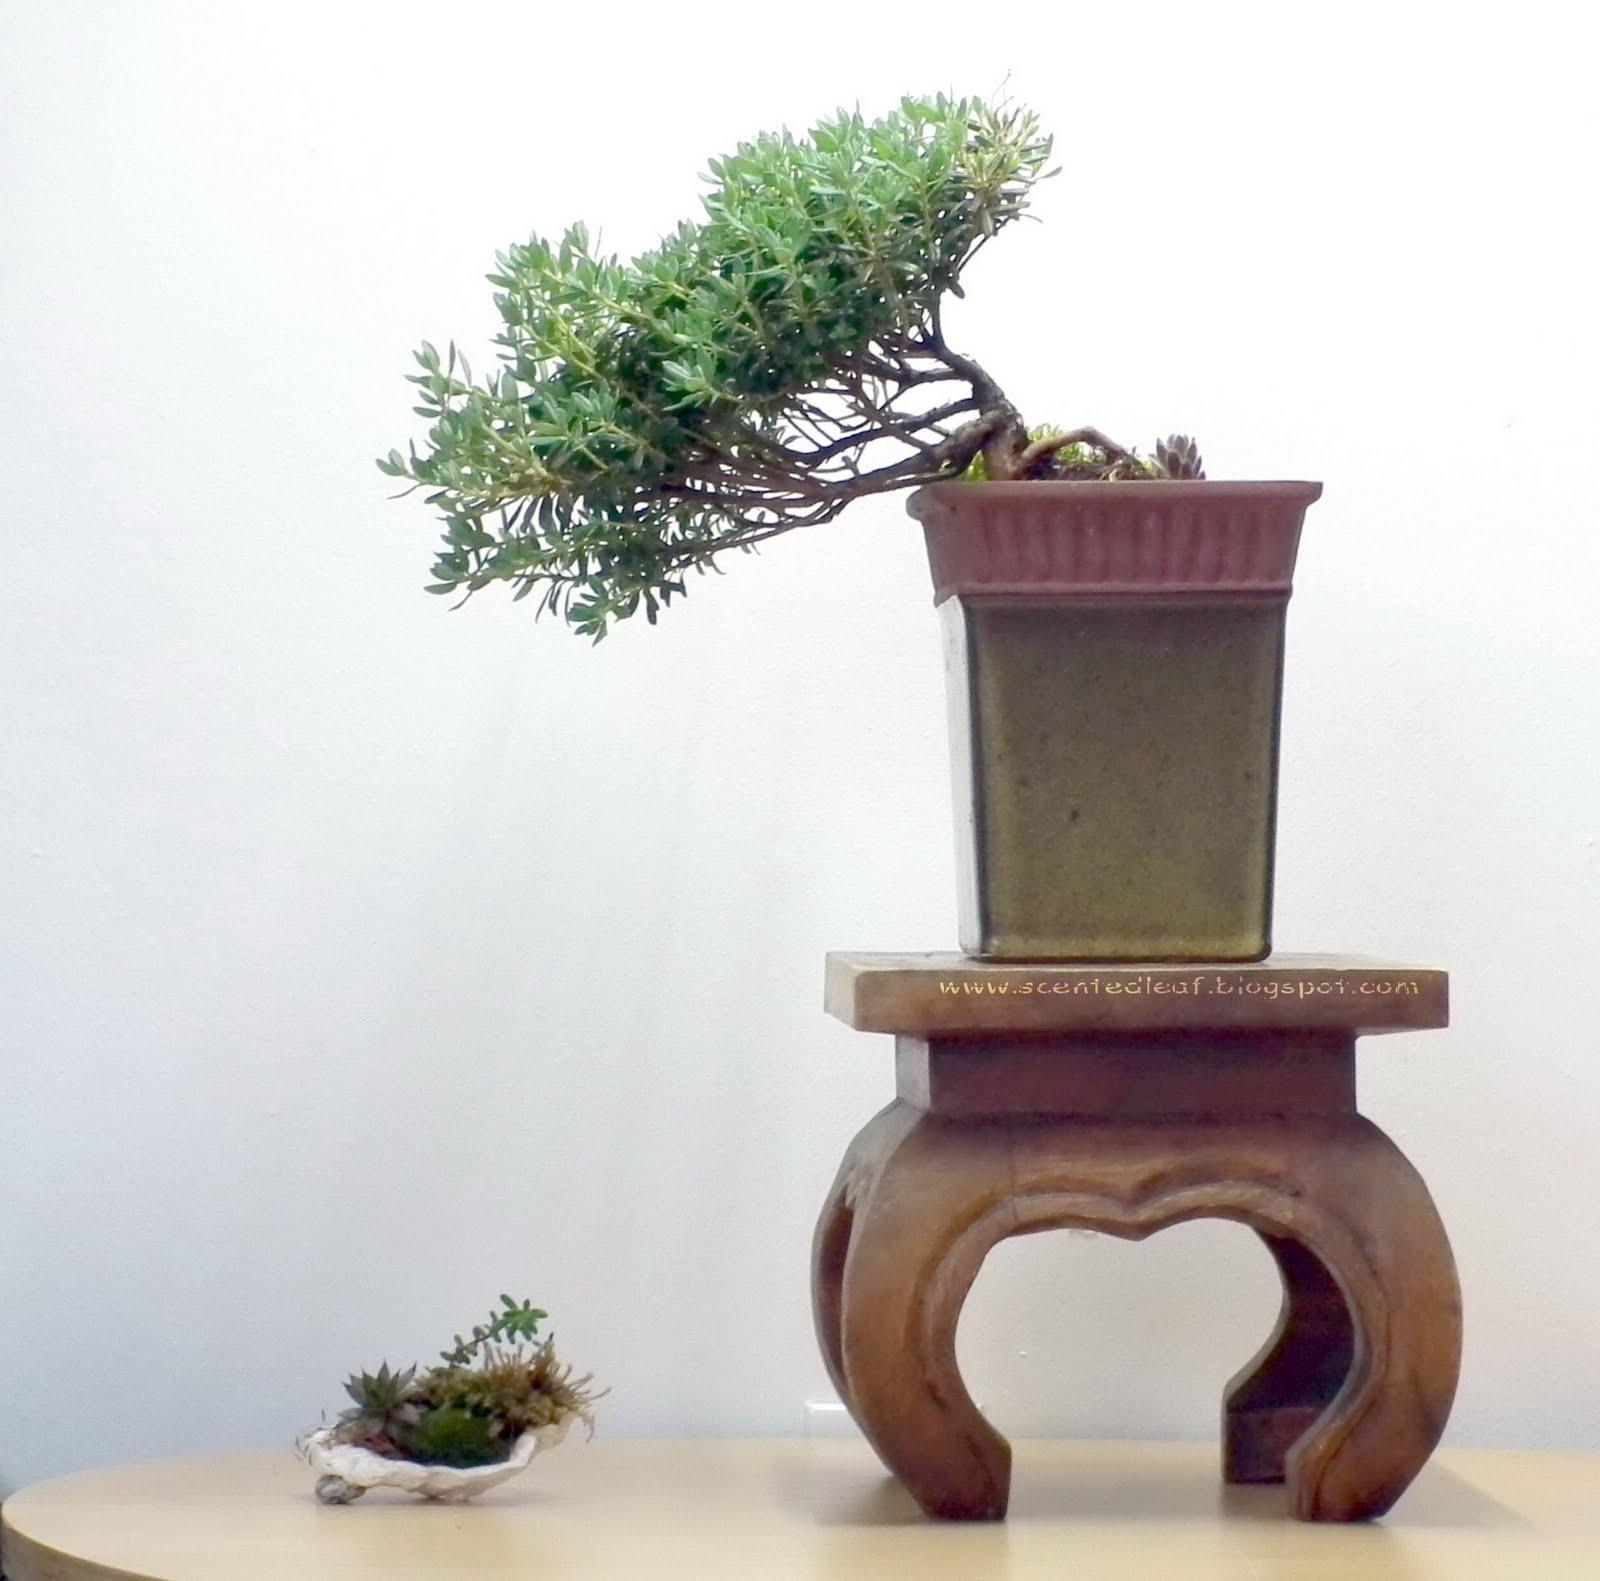 Scented Leaf Pjm Rhododendron Bonsai